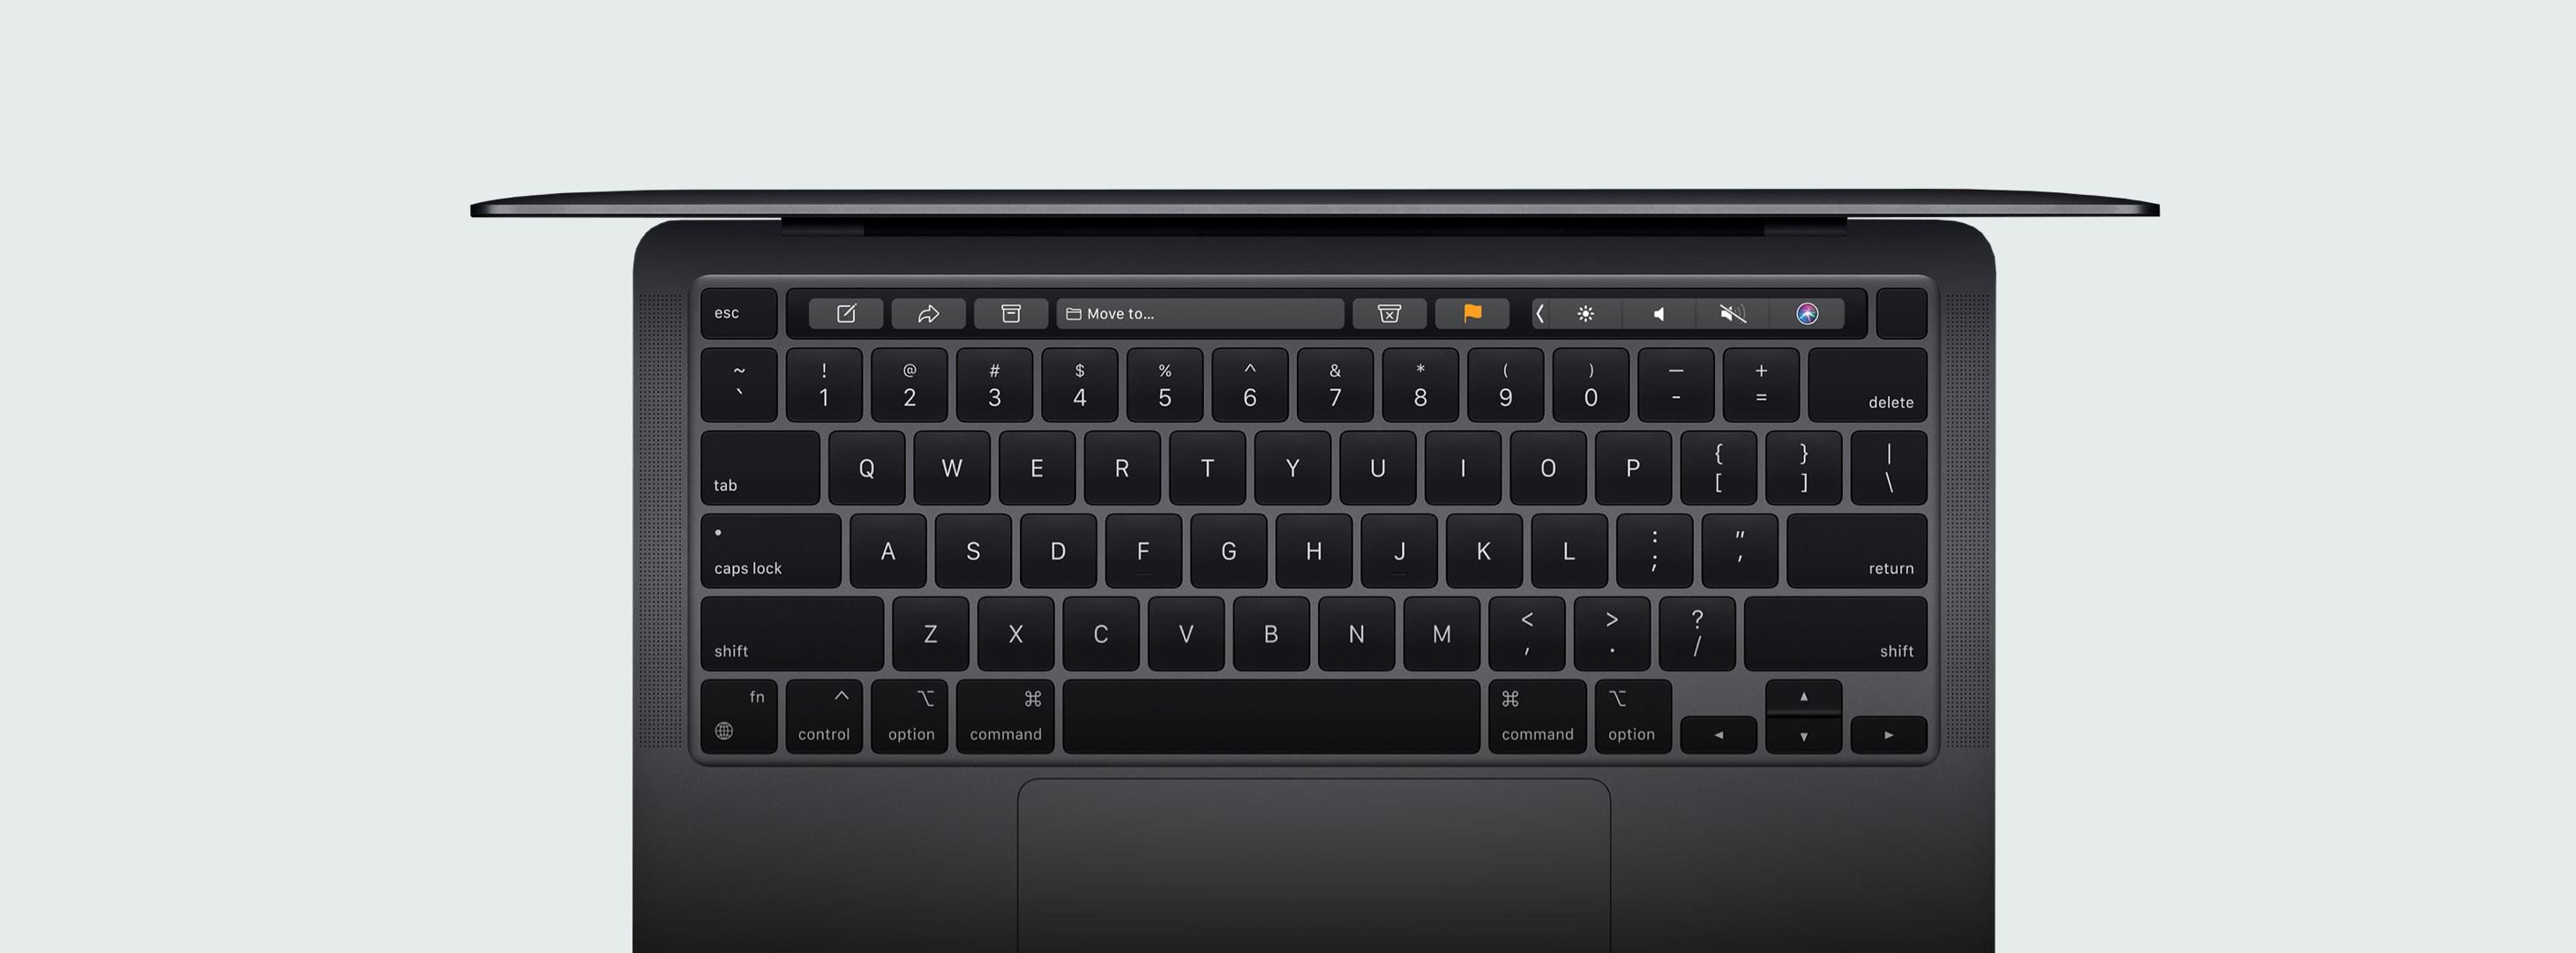 allapplenews-macbook-pro-2020-touch-bar